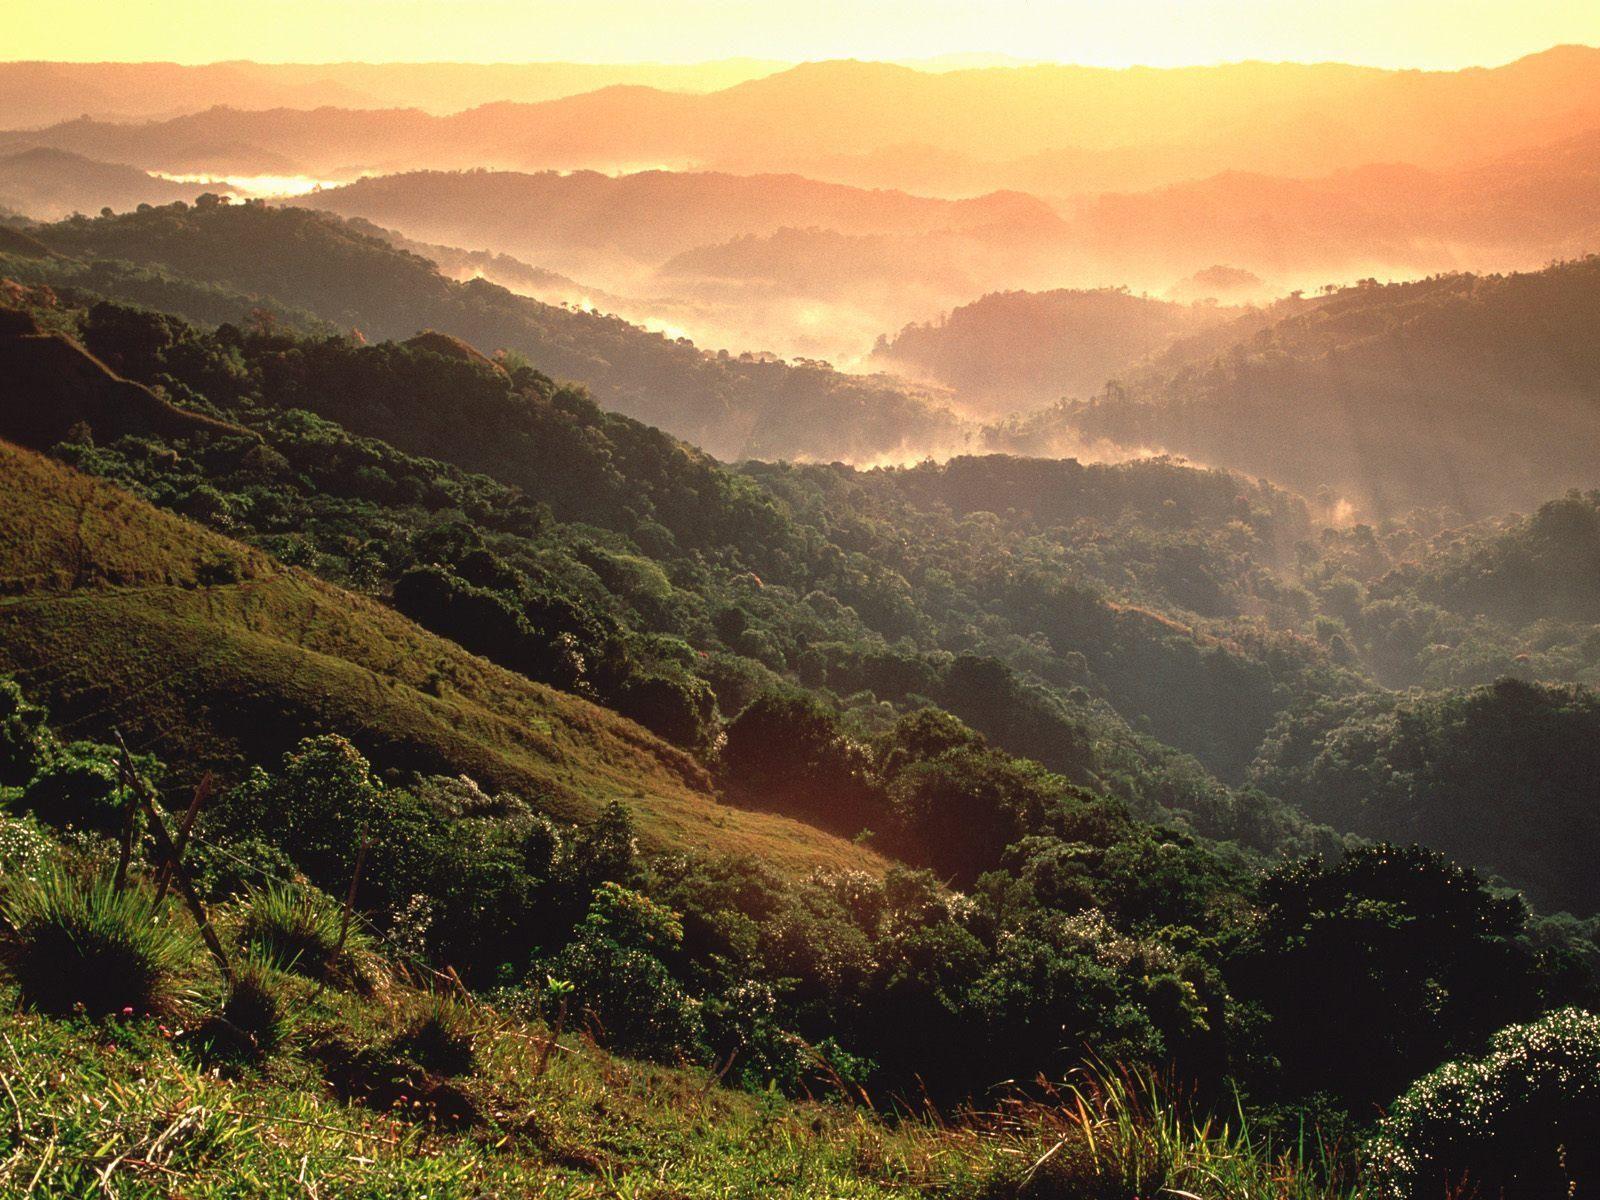 amazon rainforest south america - photo #9